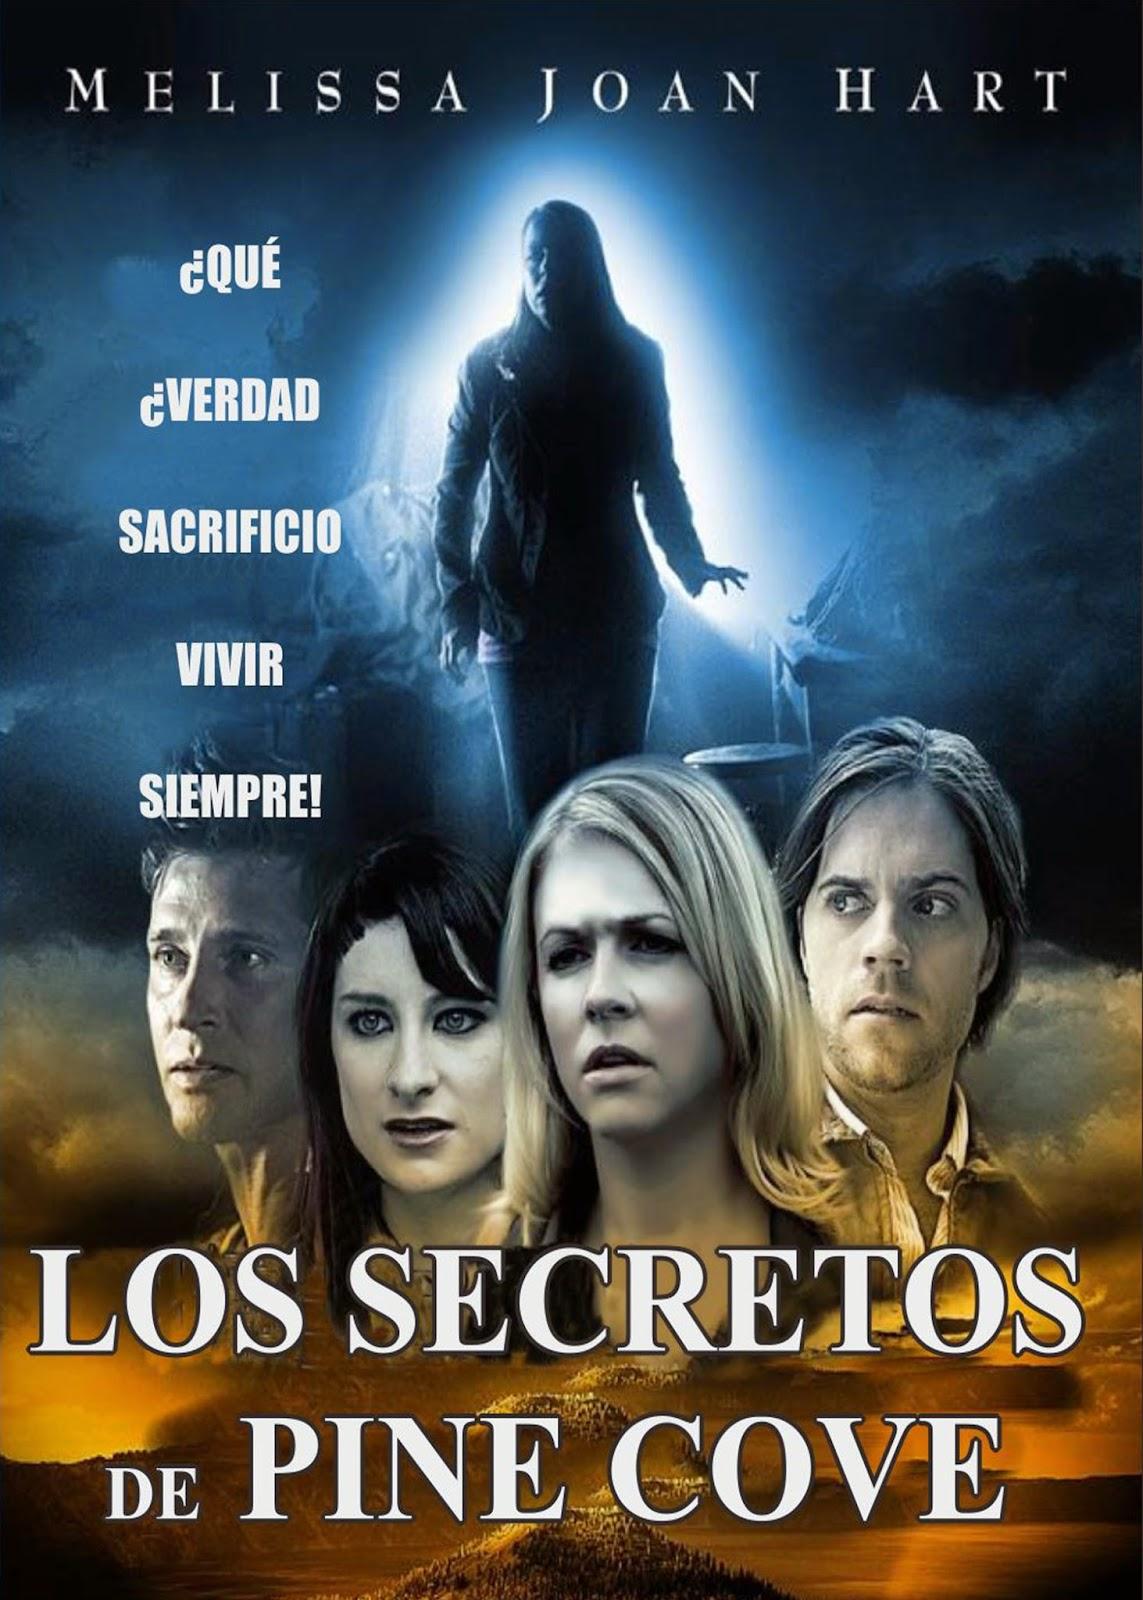 Los secretos de Pine Cove (2008)